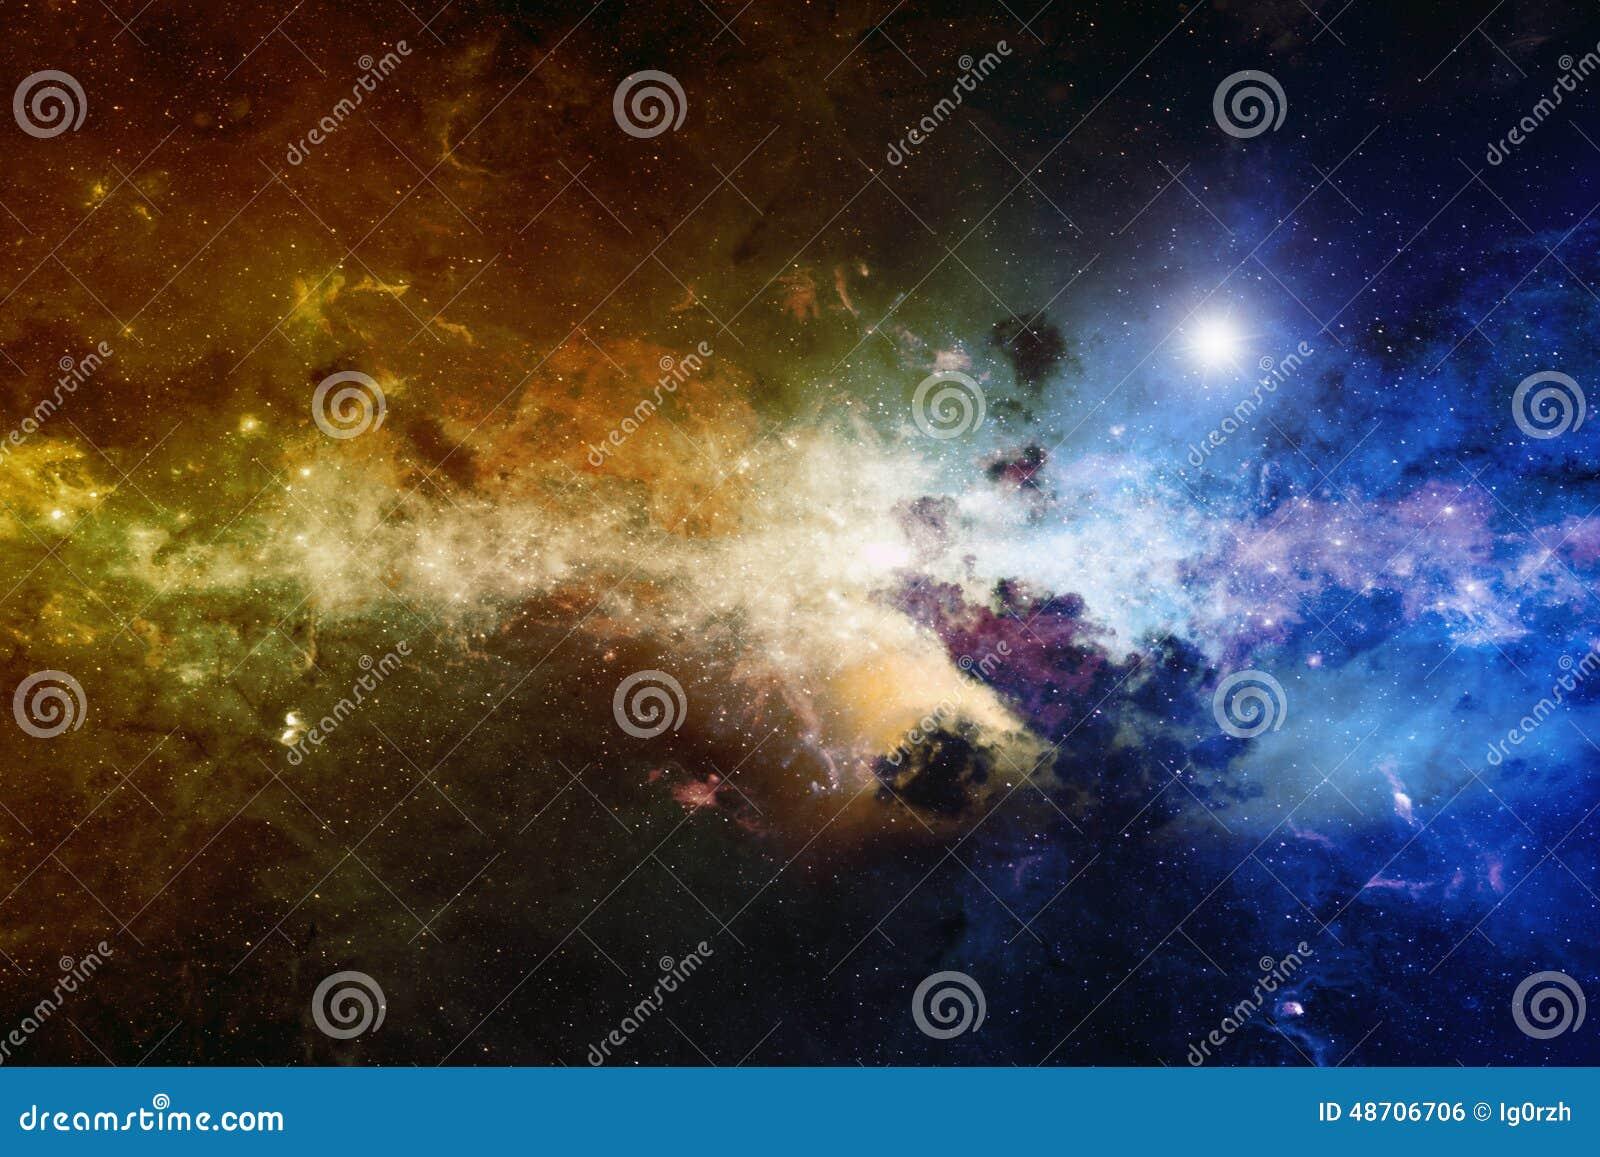 Nebula, deep space